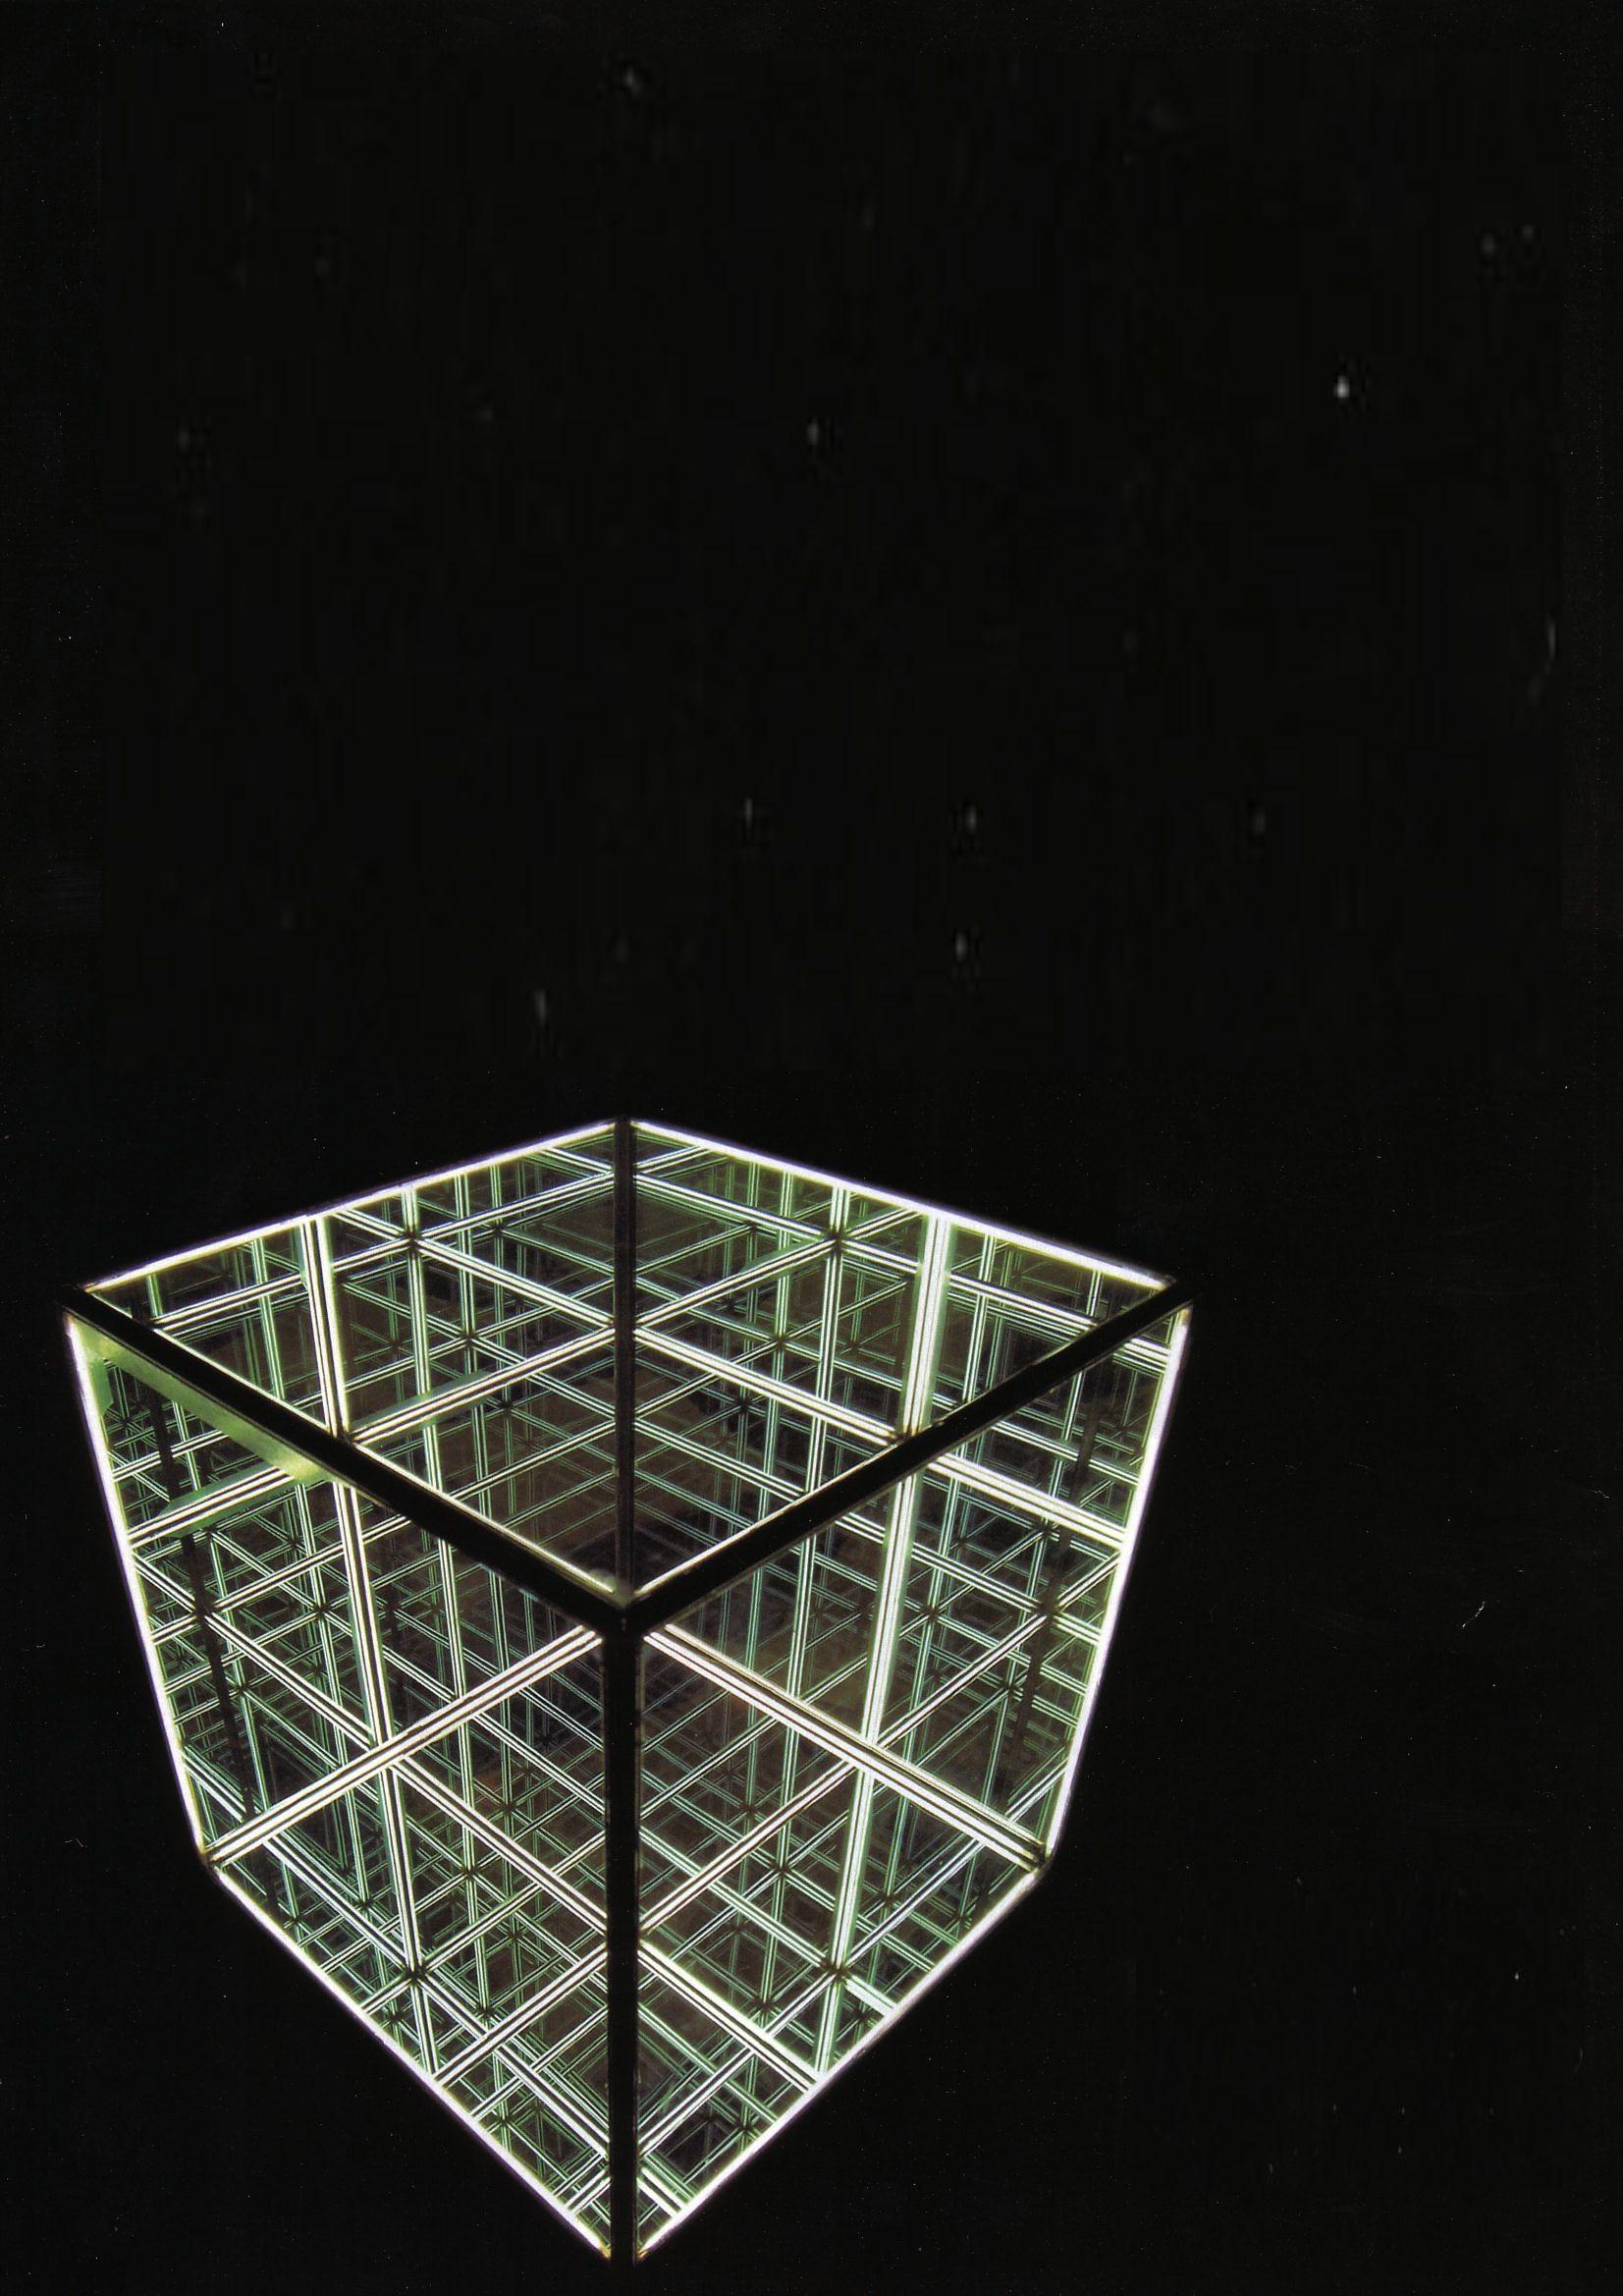 Pin by Nadja Zerunian on light | Cube, Light art, Two way ...